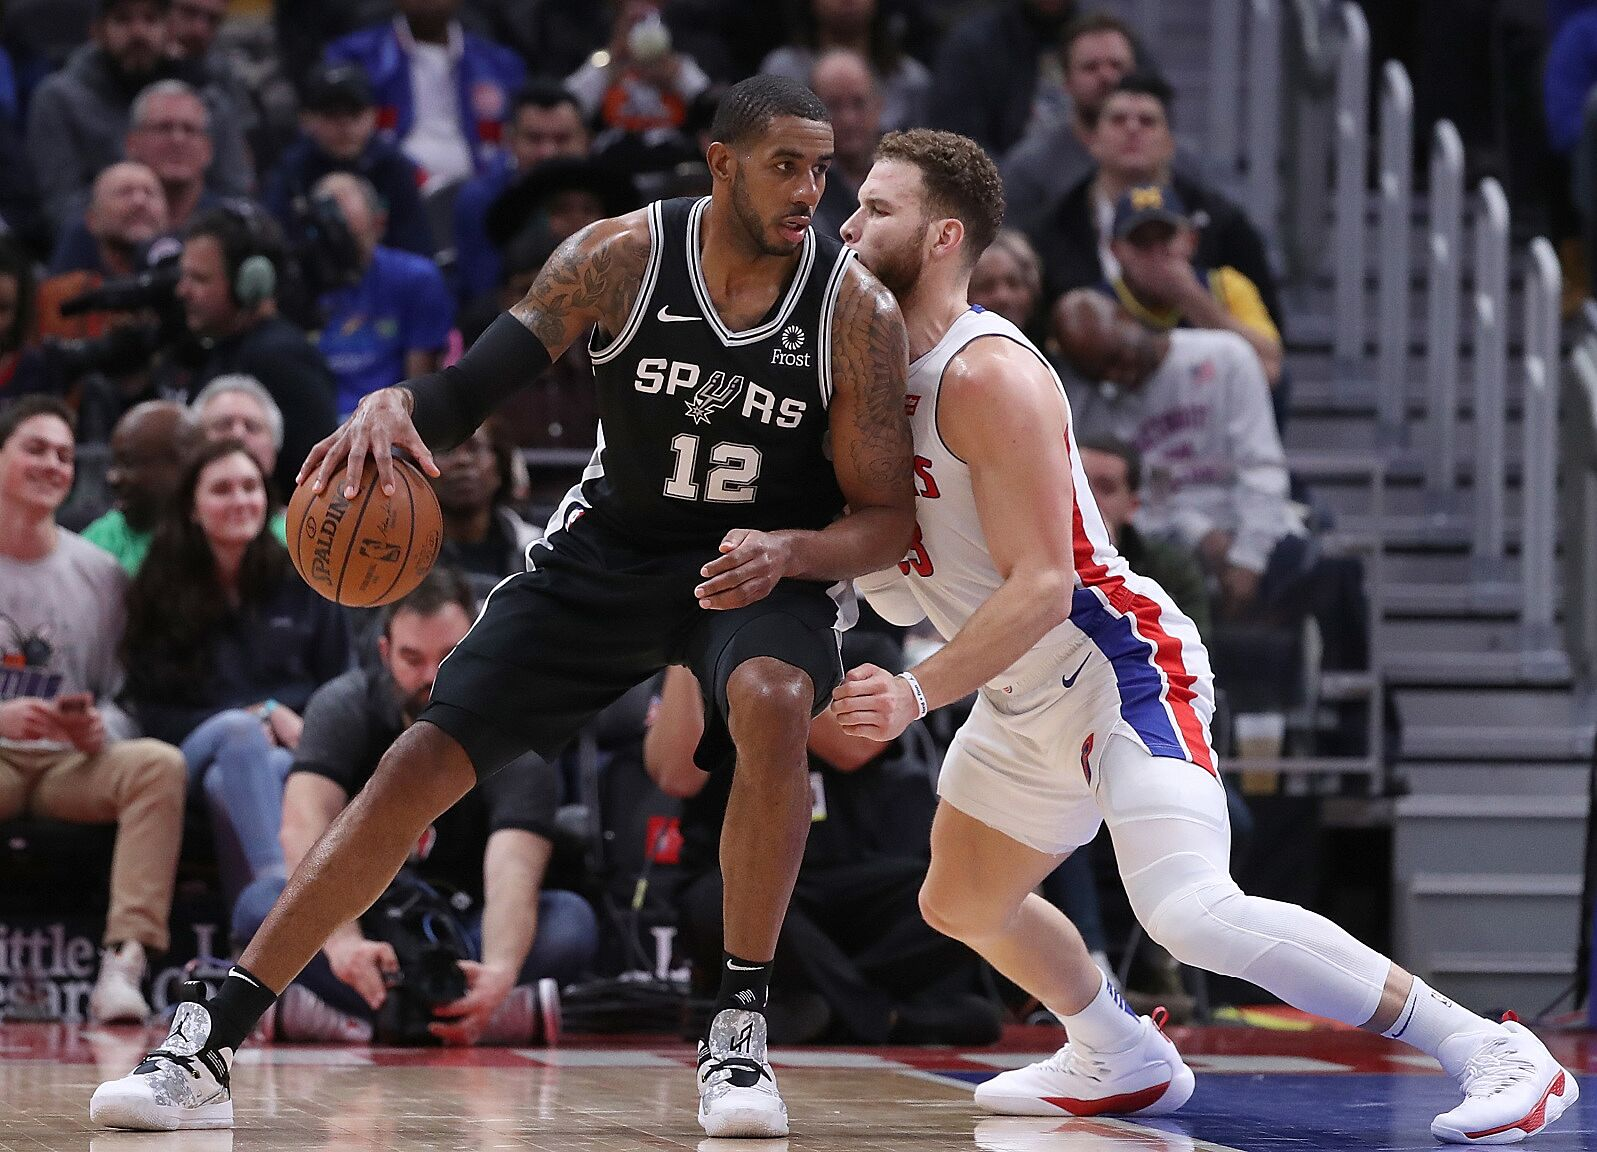 Detroit Pistons vs. San Antonio Spurs 2019-20 season preview